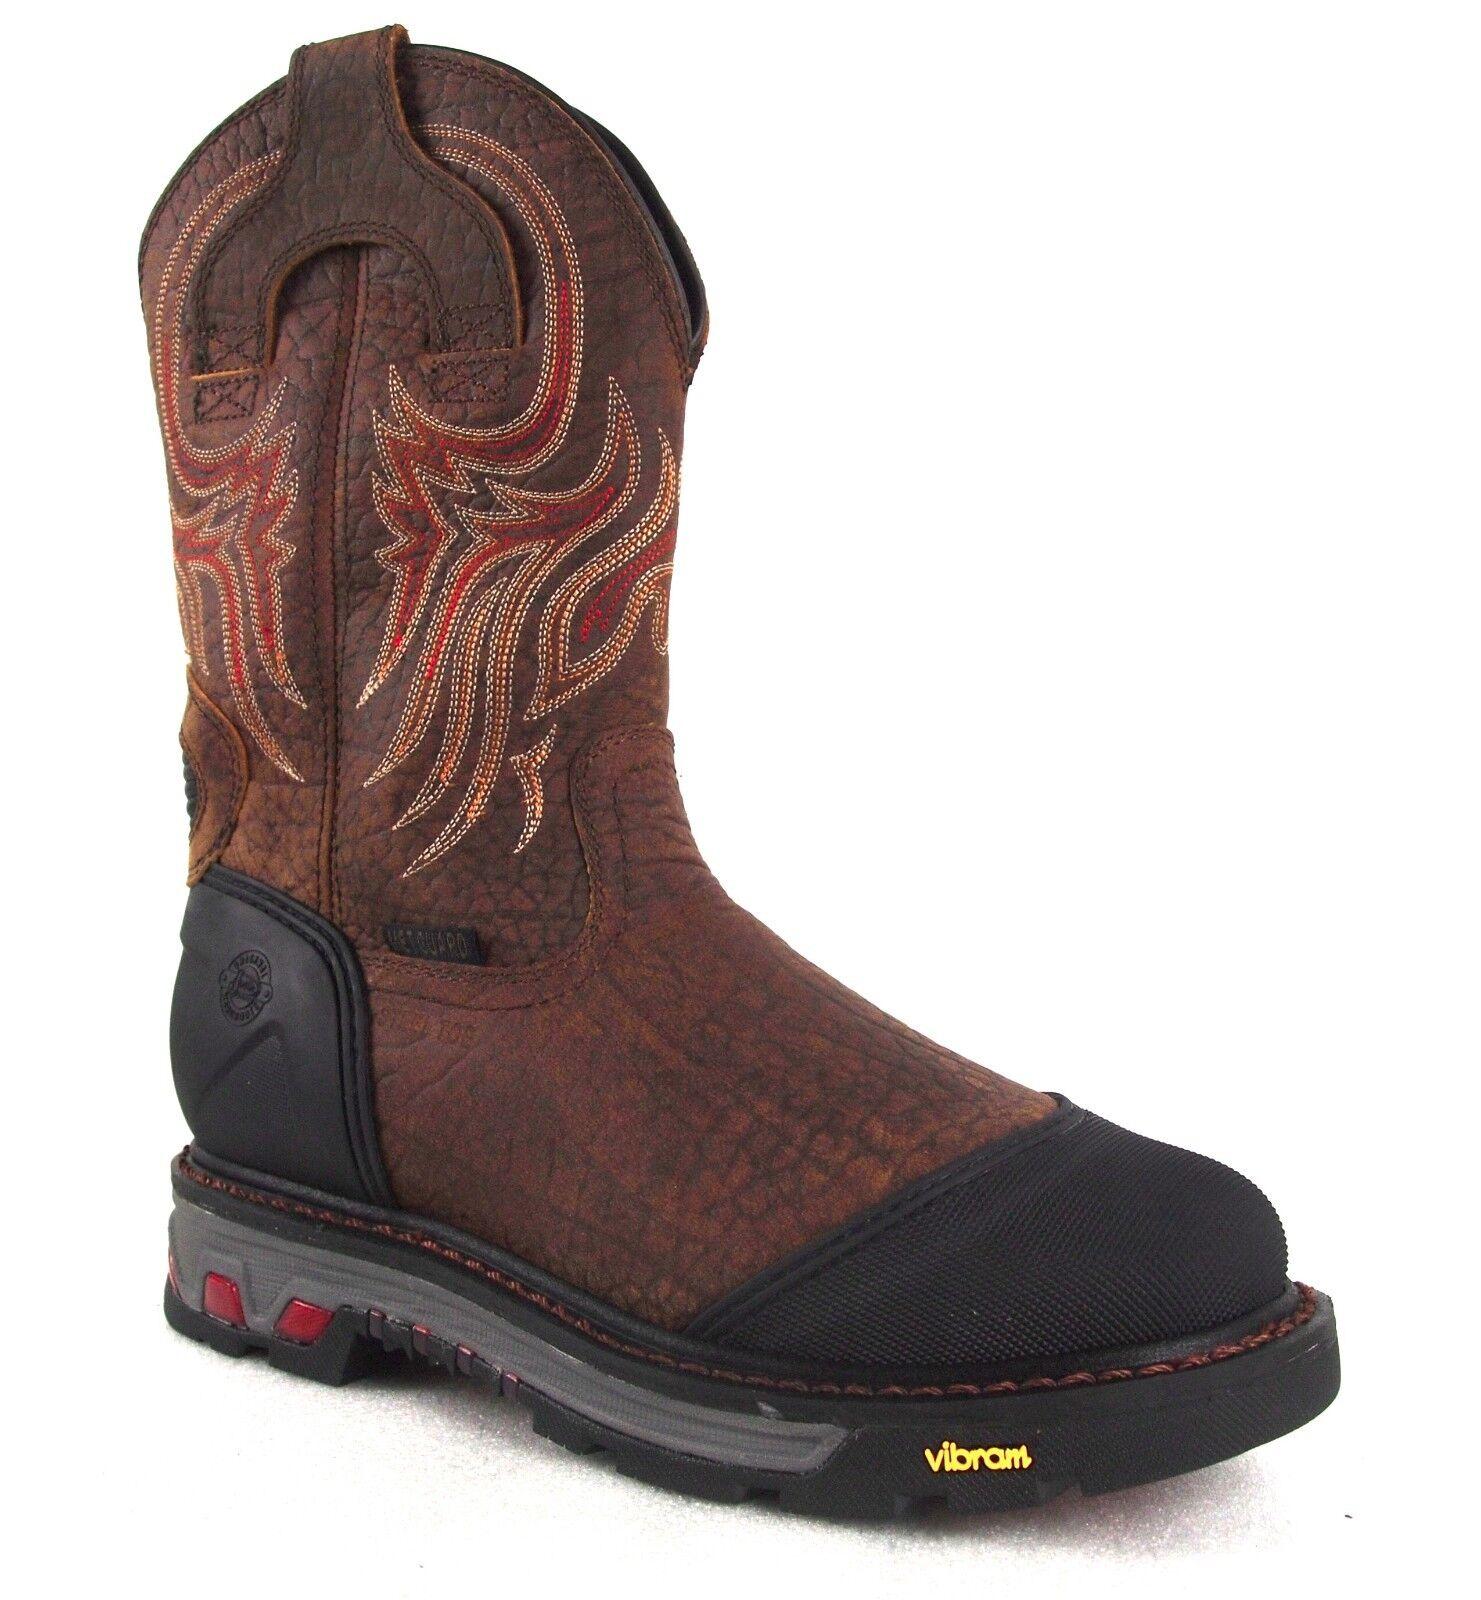 Justin WK2114 Commander-X5 Waterproof Steel Toe Met-Guard 11  Safety Work Boots